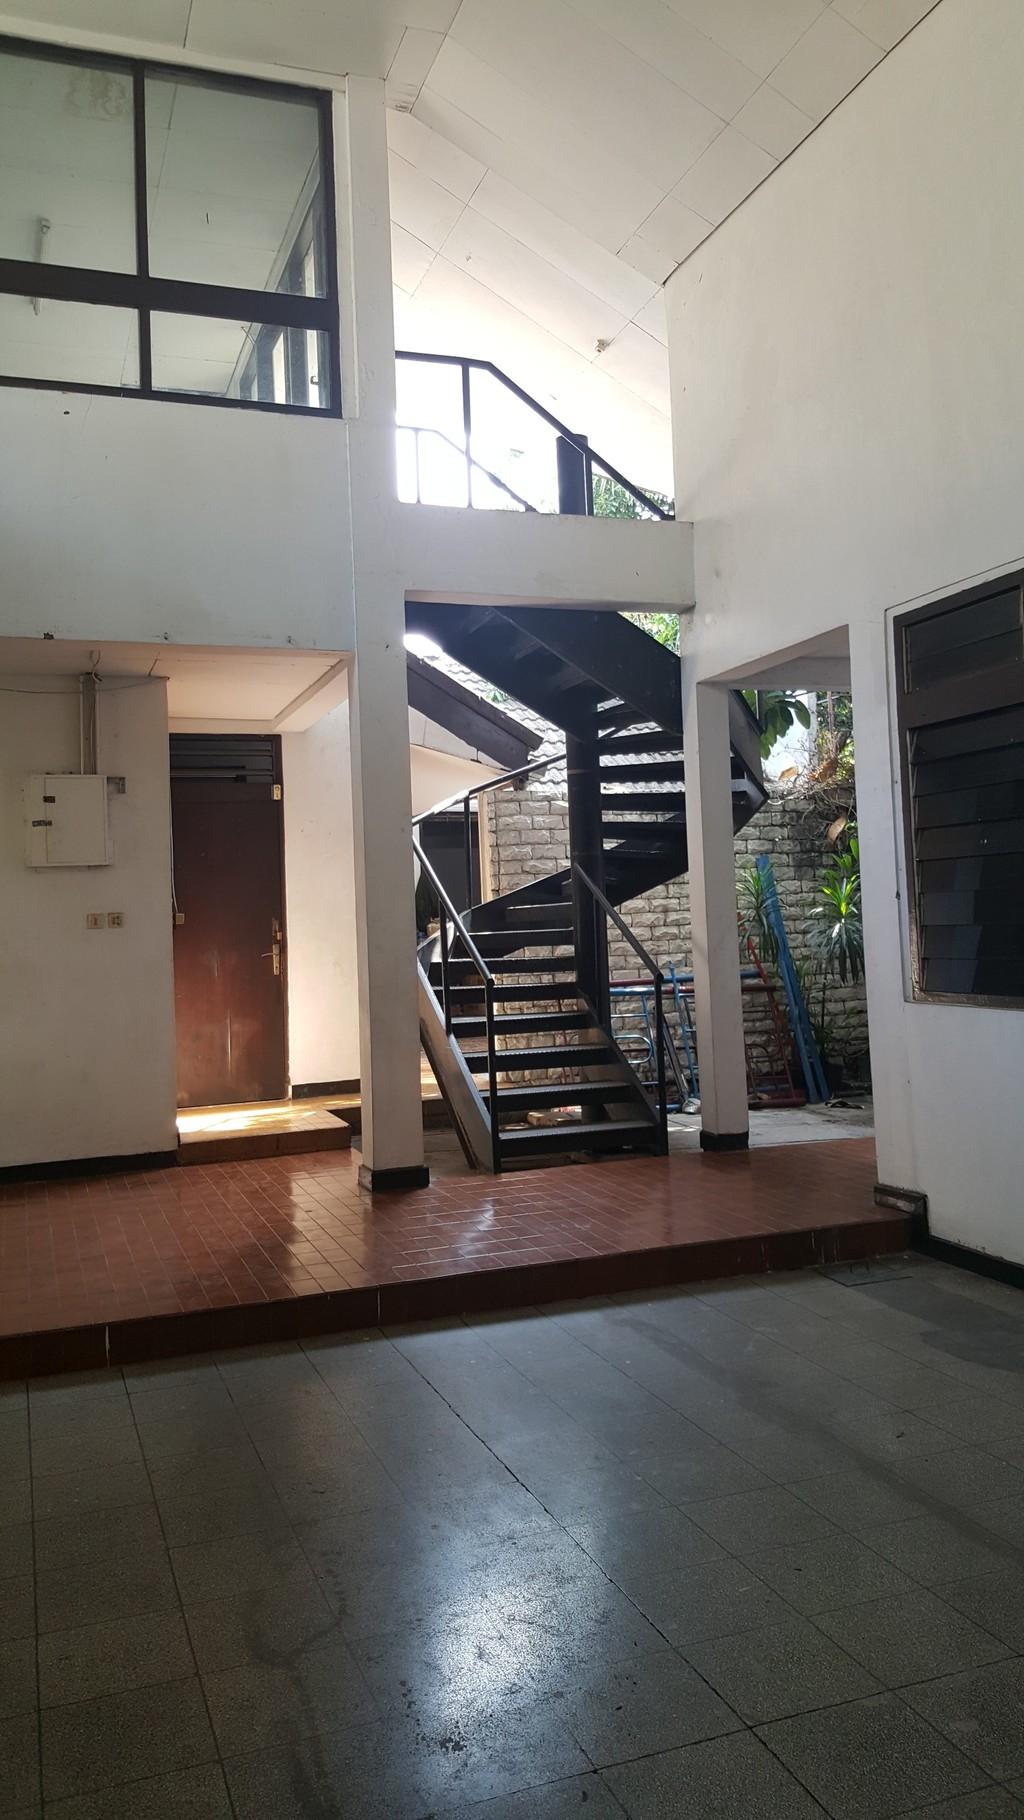 OPEN HOUSE Sabtu - Minggu ...10.00 wib sd 16.00 wib Dijual Rumah Di Lebak Bulus 2 Jakarta Selatan